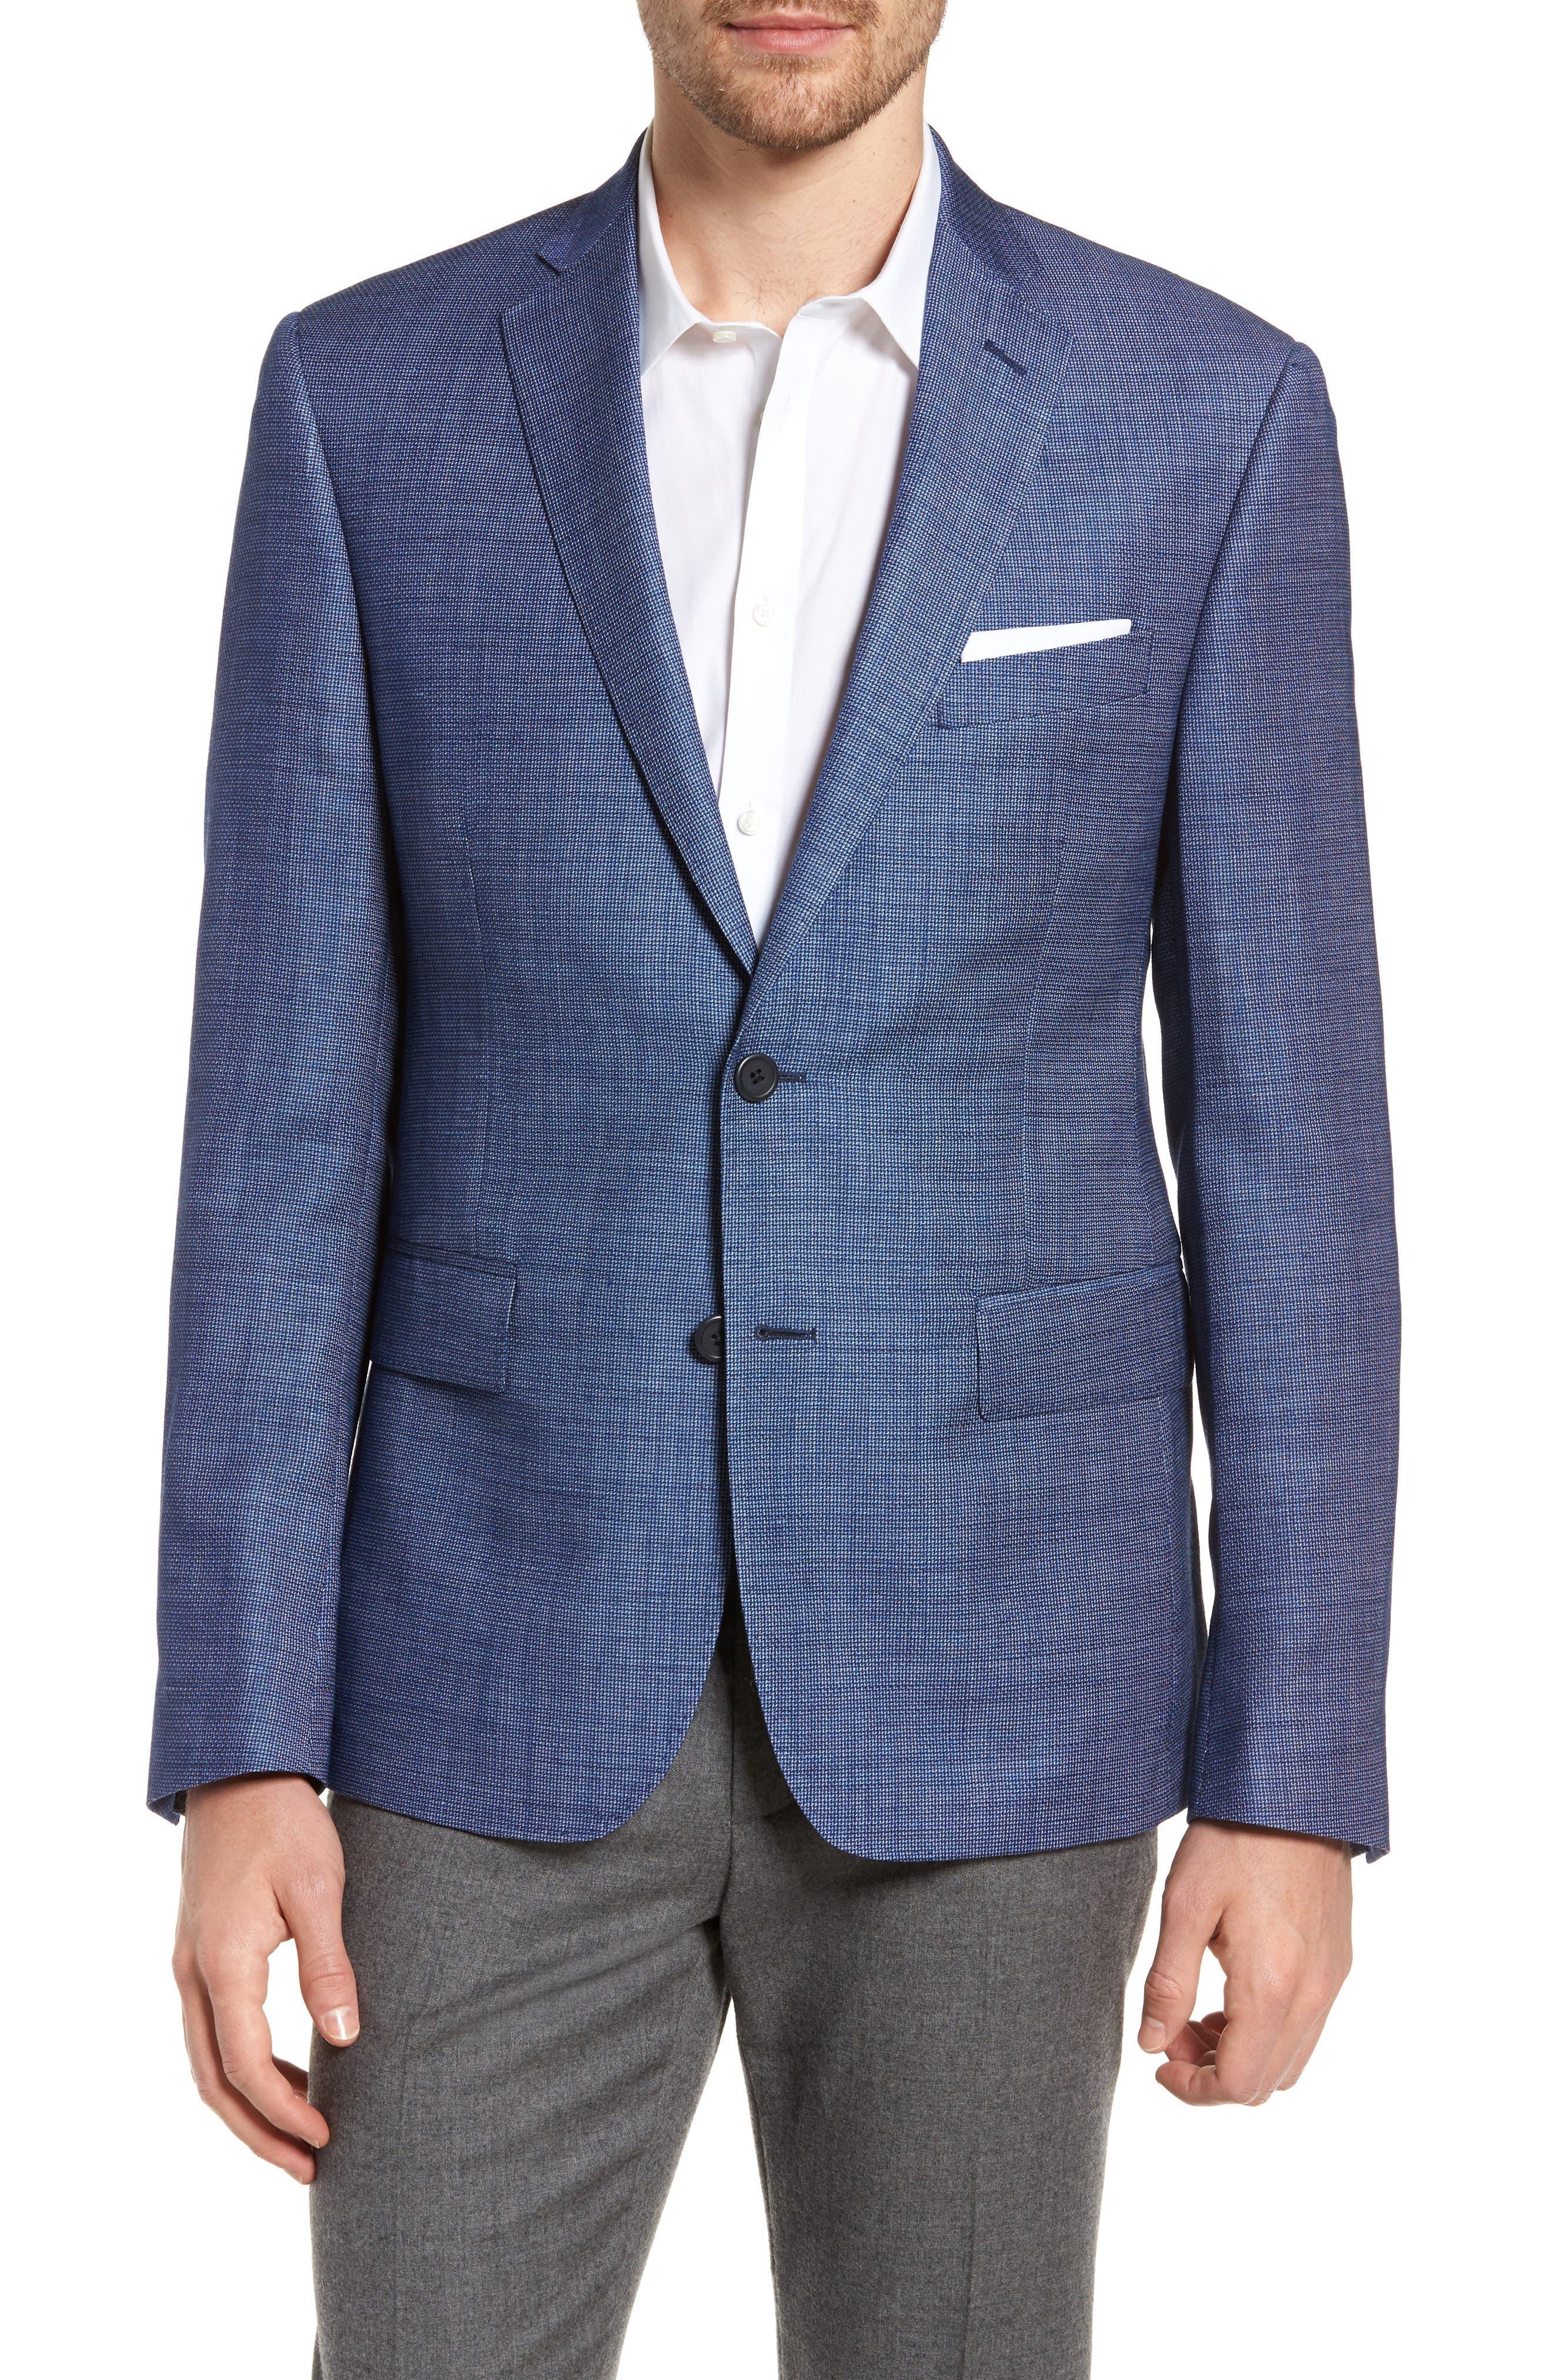 Extra Trim Fit Wool & Linen Blazer,                         Main,                         color, Navy Blue